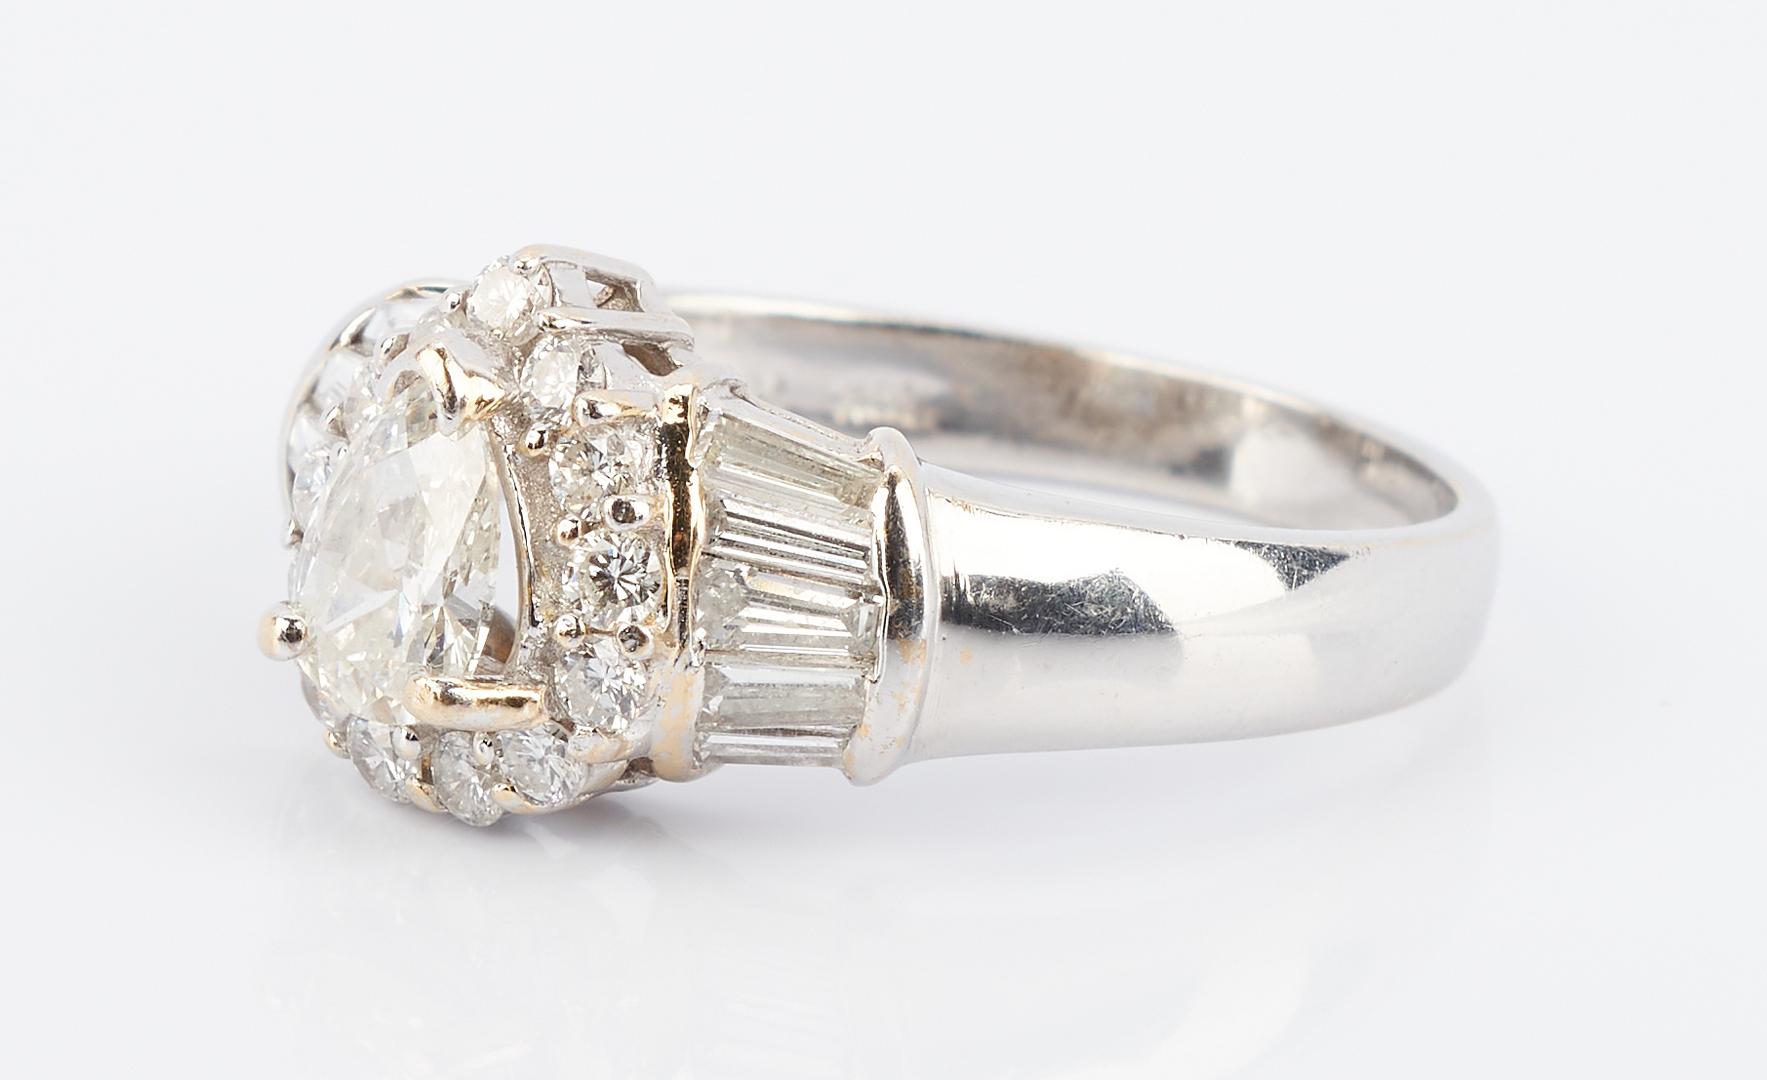 Lot 489: Ladies 18K Gold & Pear Shaped Diamond Ring